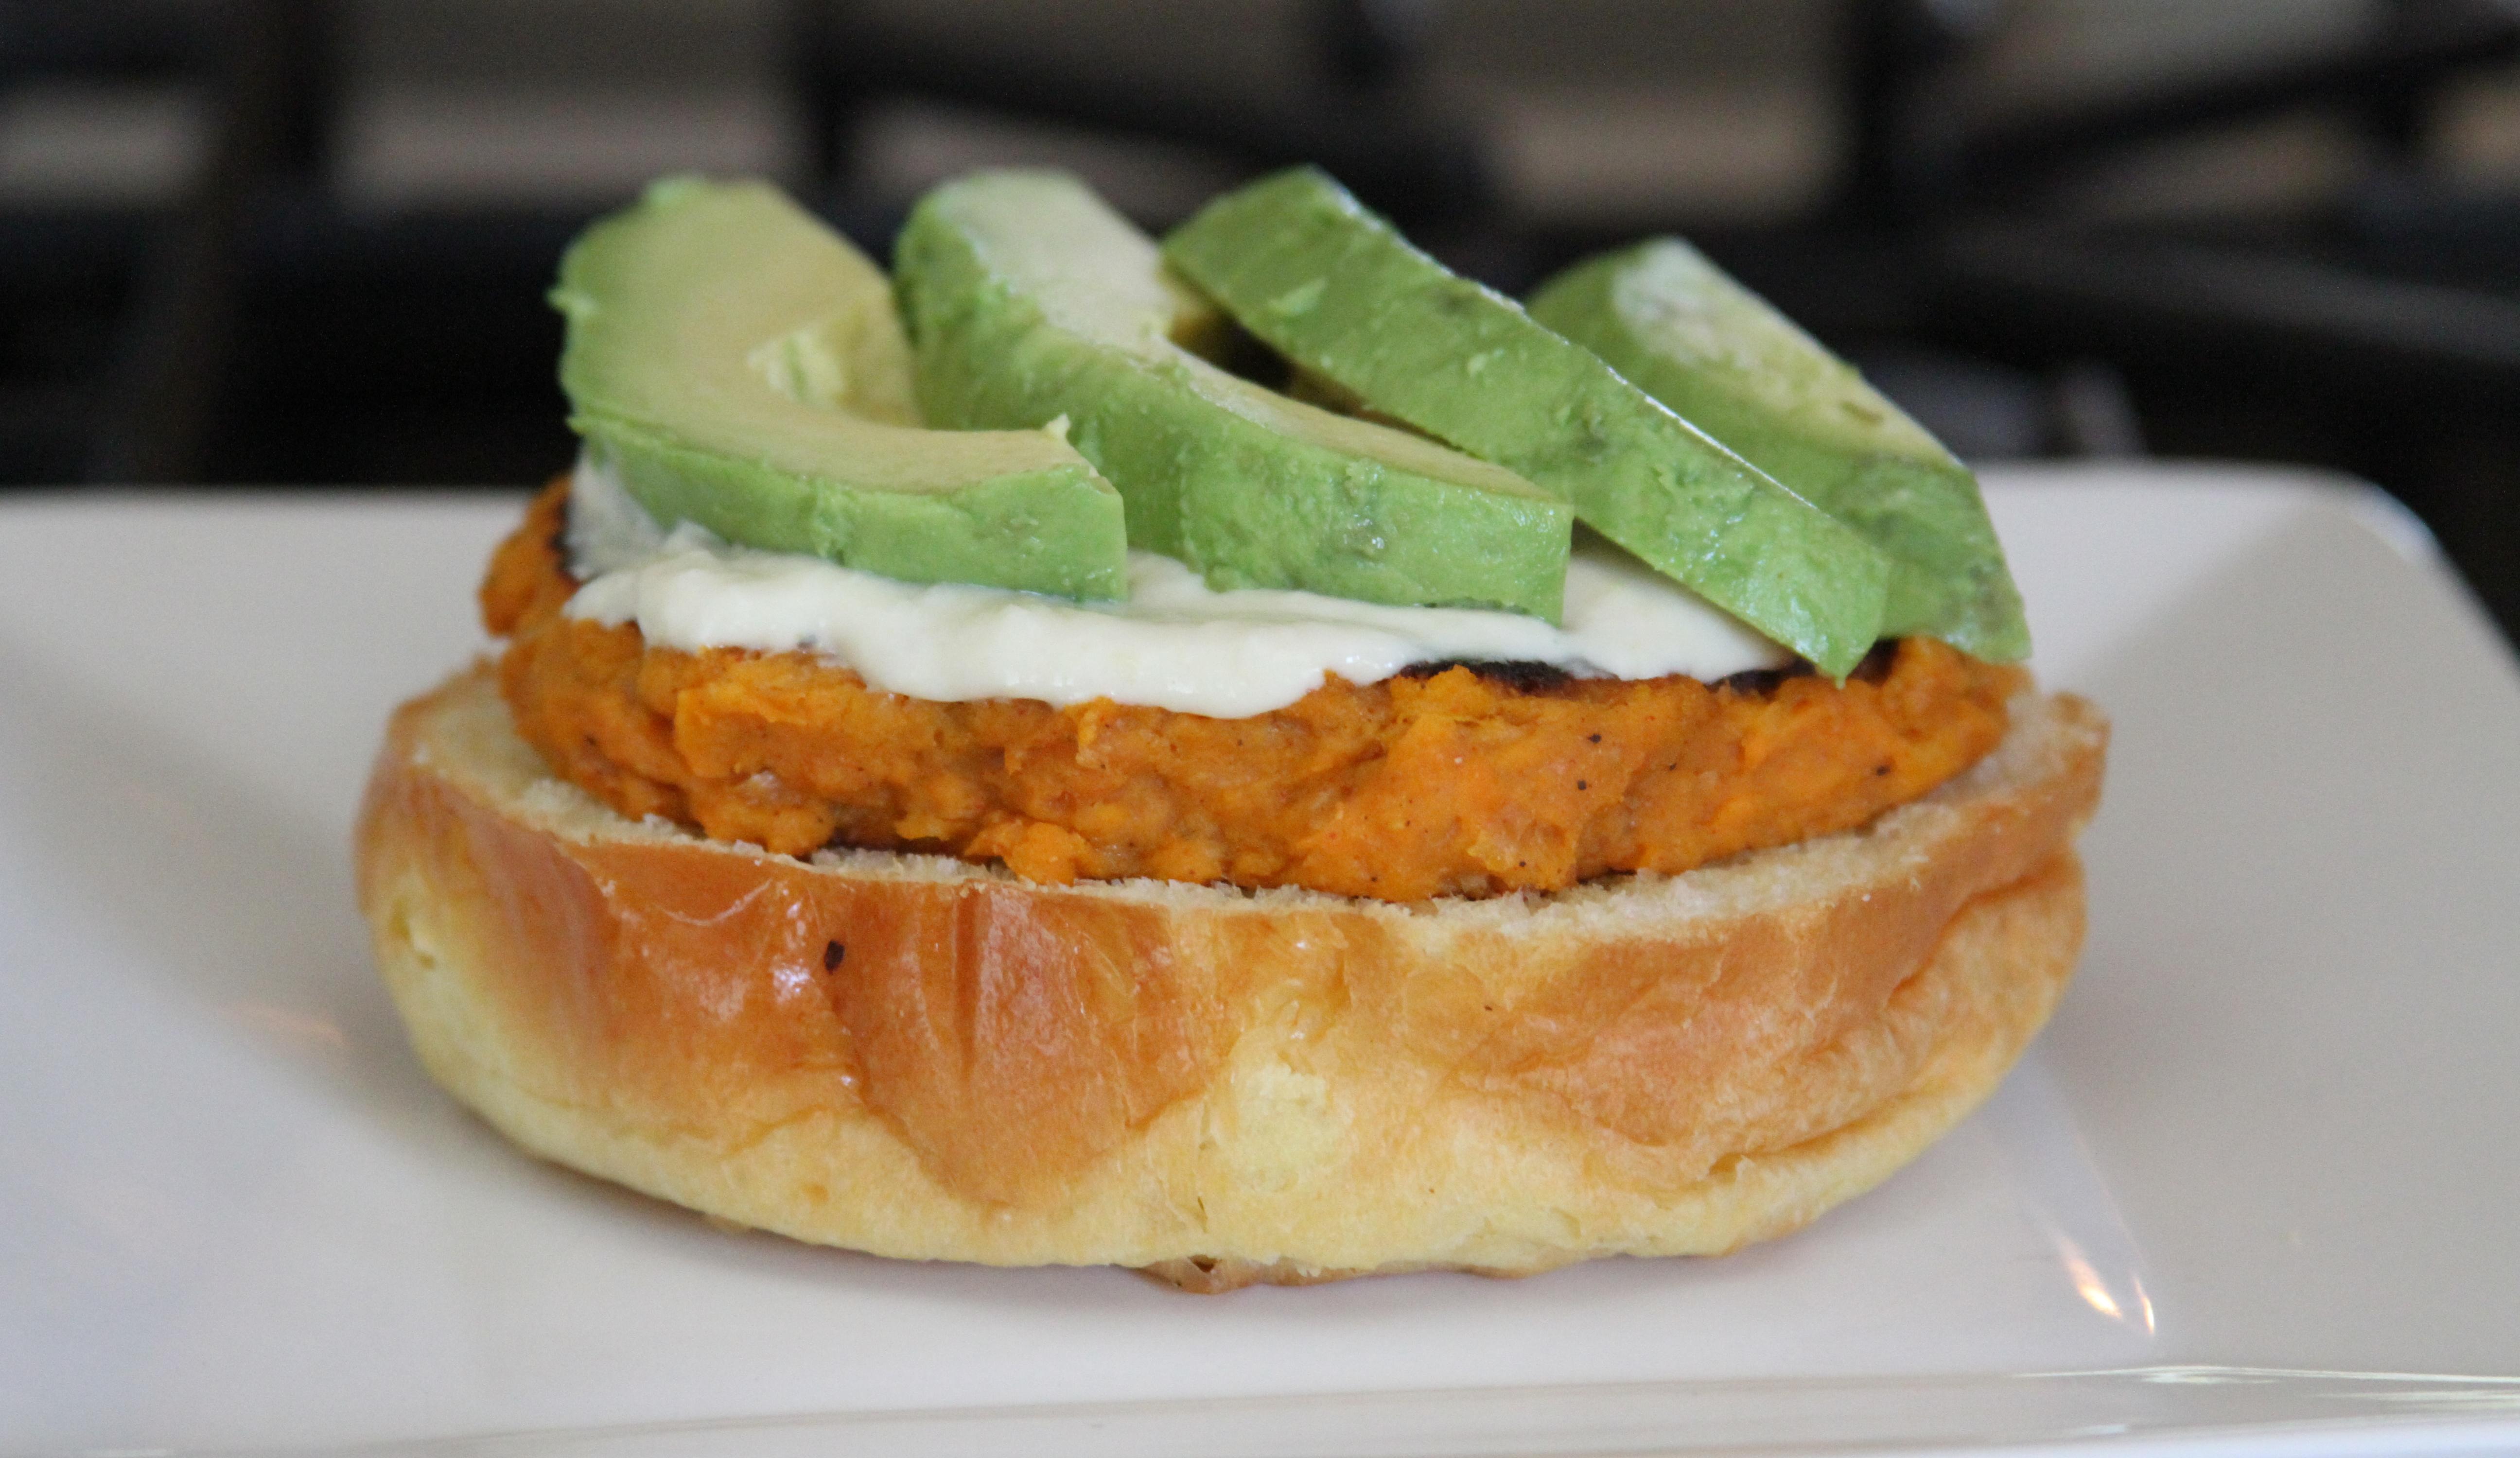 Sweet Potato Patty with Avocado